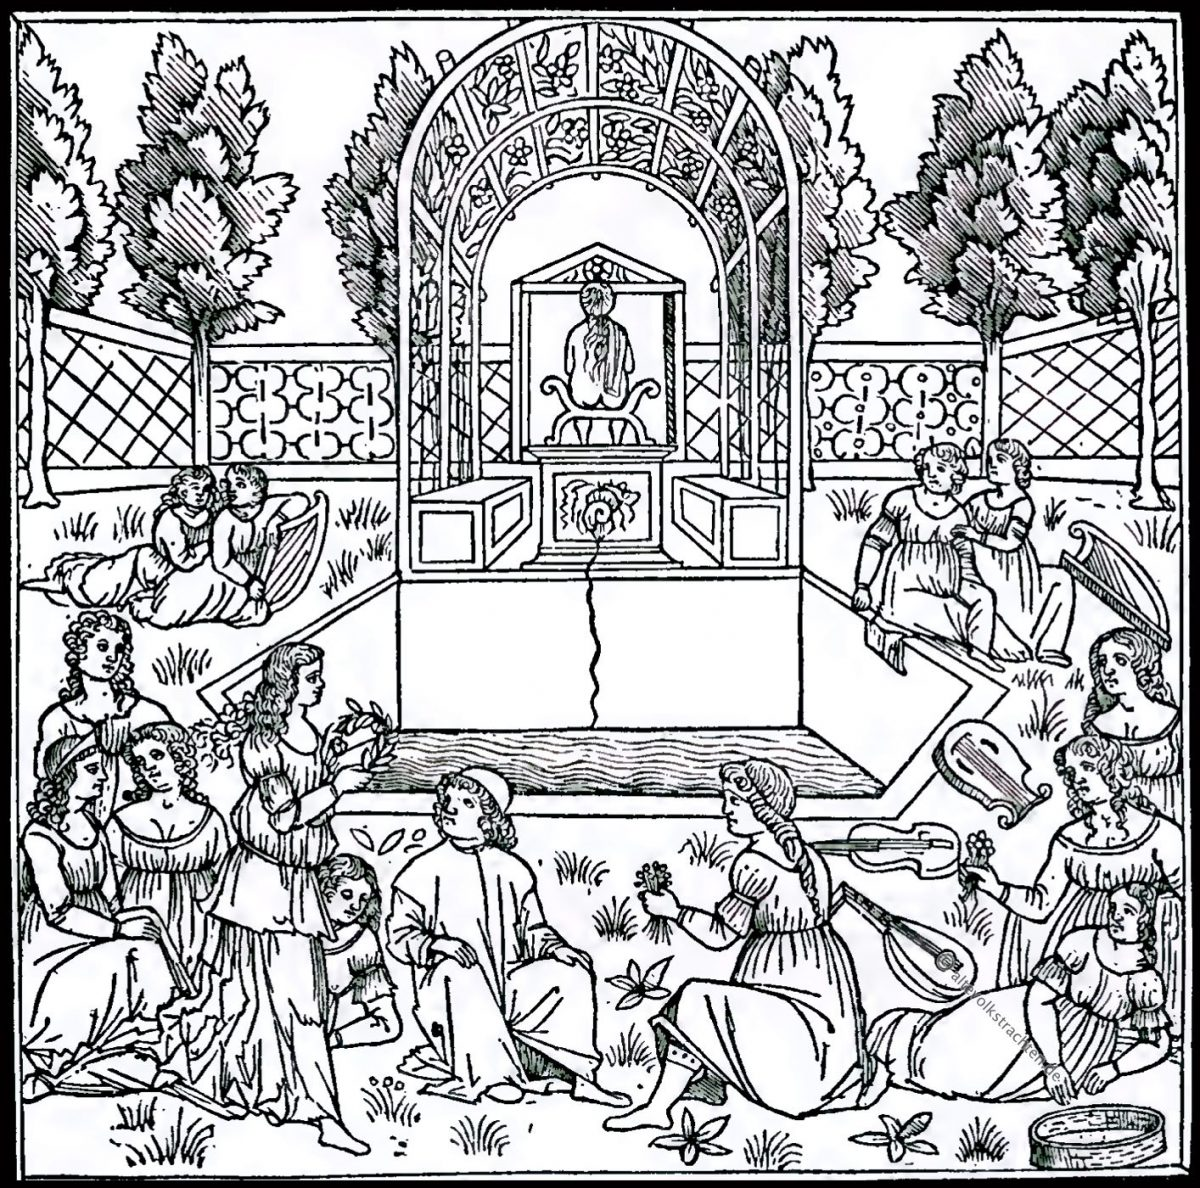 Hypnerotomachia, Poliphili, Renaissance, Roman, Francesco Colonna